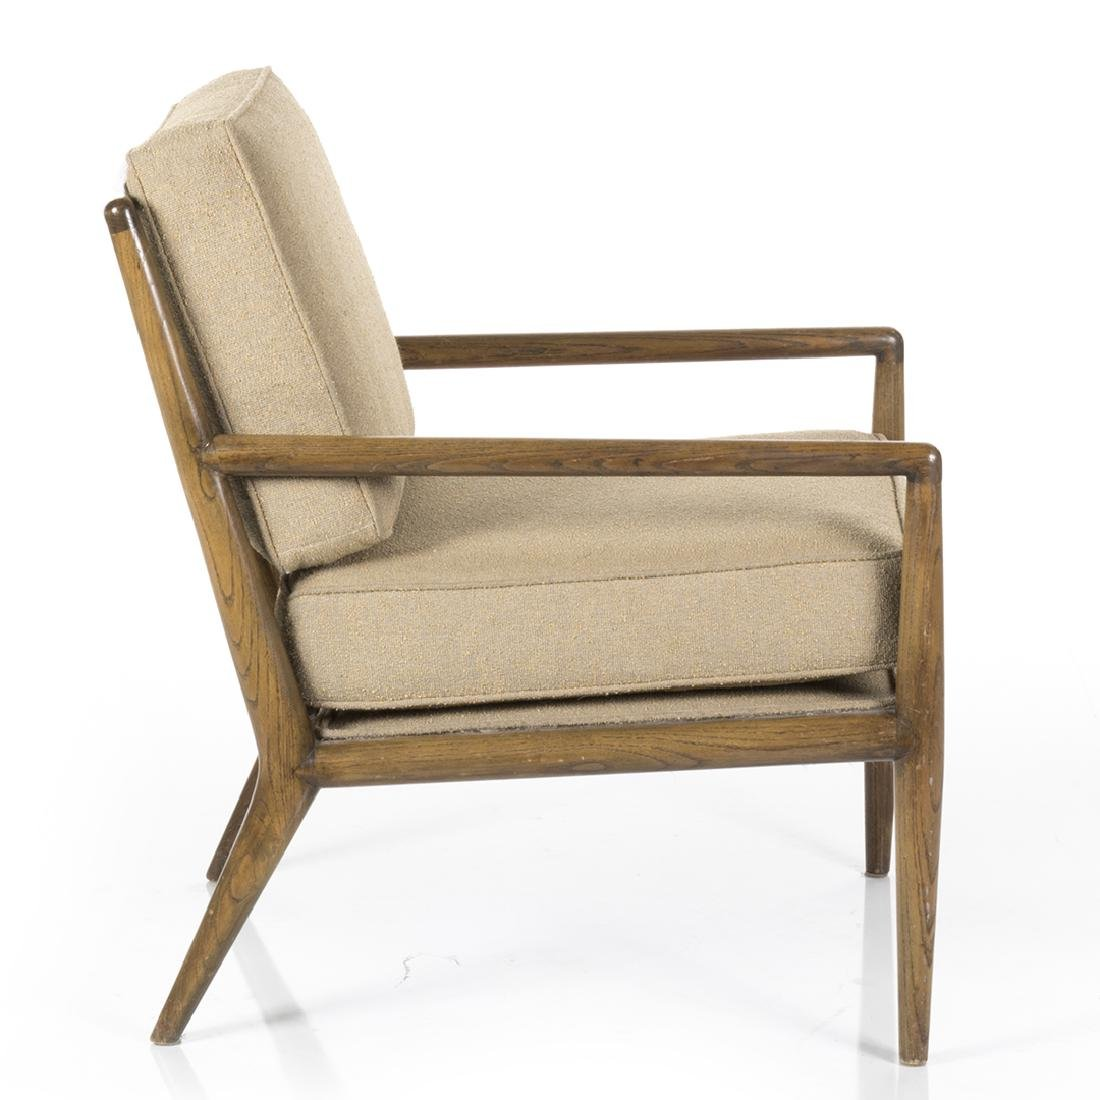 T.H. Robsjohn Gibbings Style Lounge Chair - 3